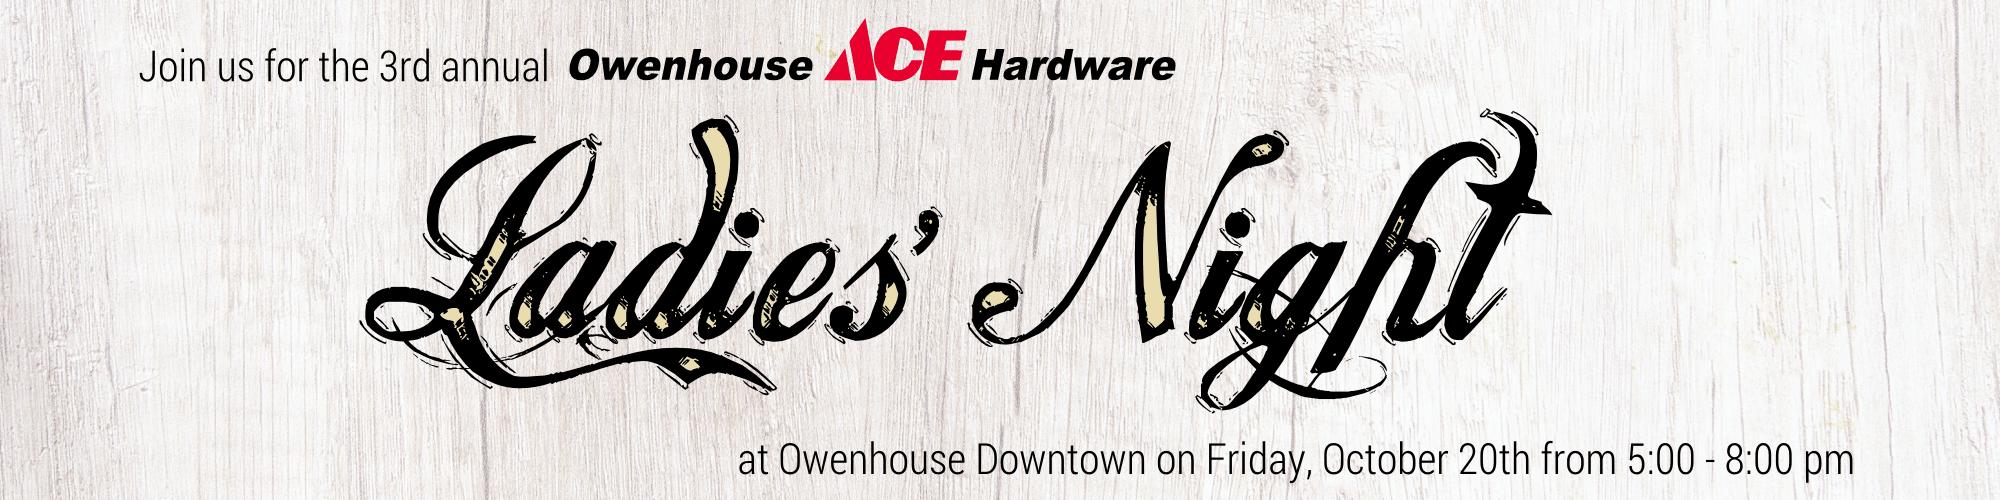 Owenhouse Ace Hardware Stores In Bozeman Montana